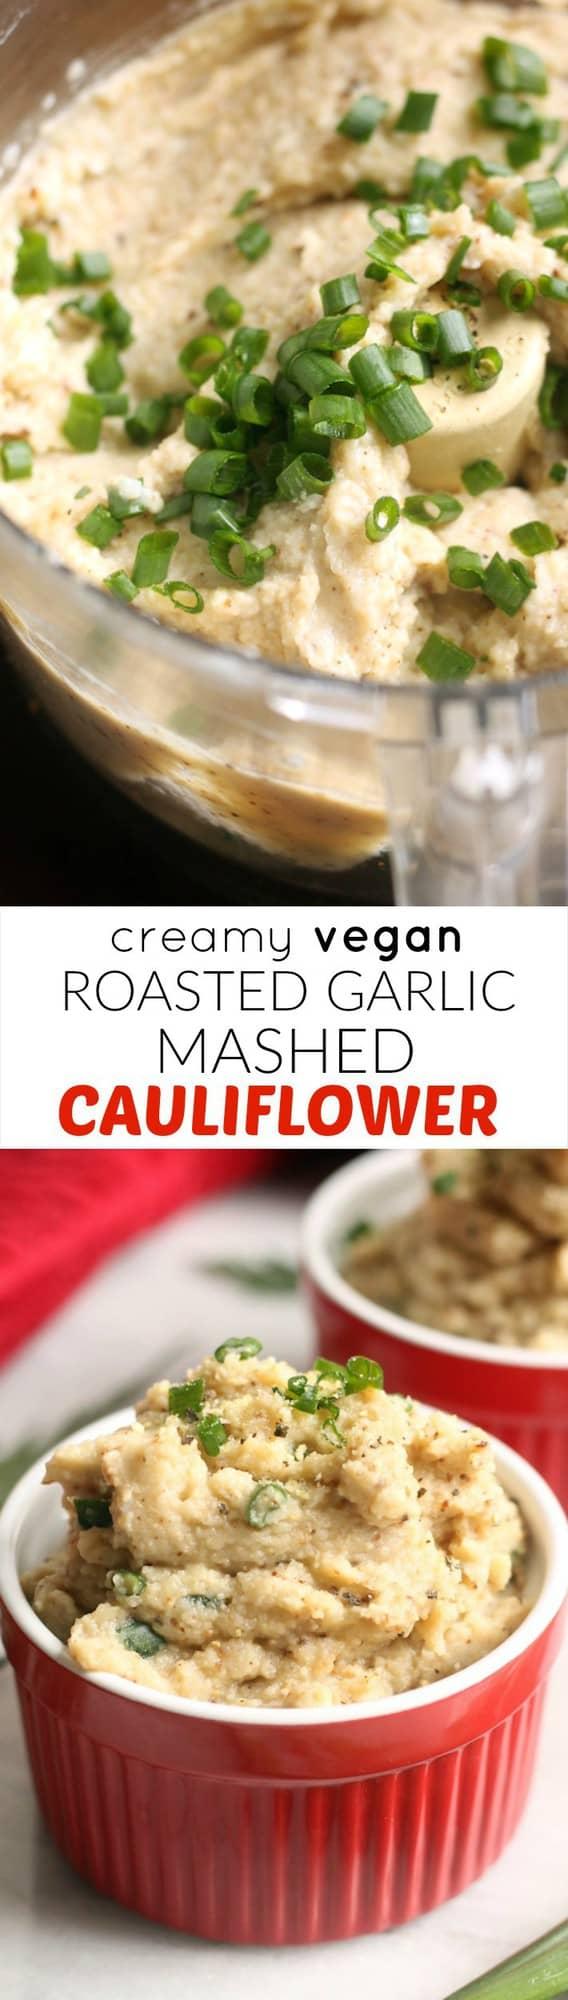 Creamy Vegan Roasted Garlic Mashed Cauliflower